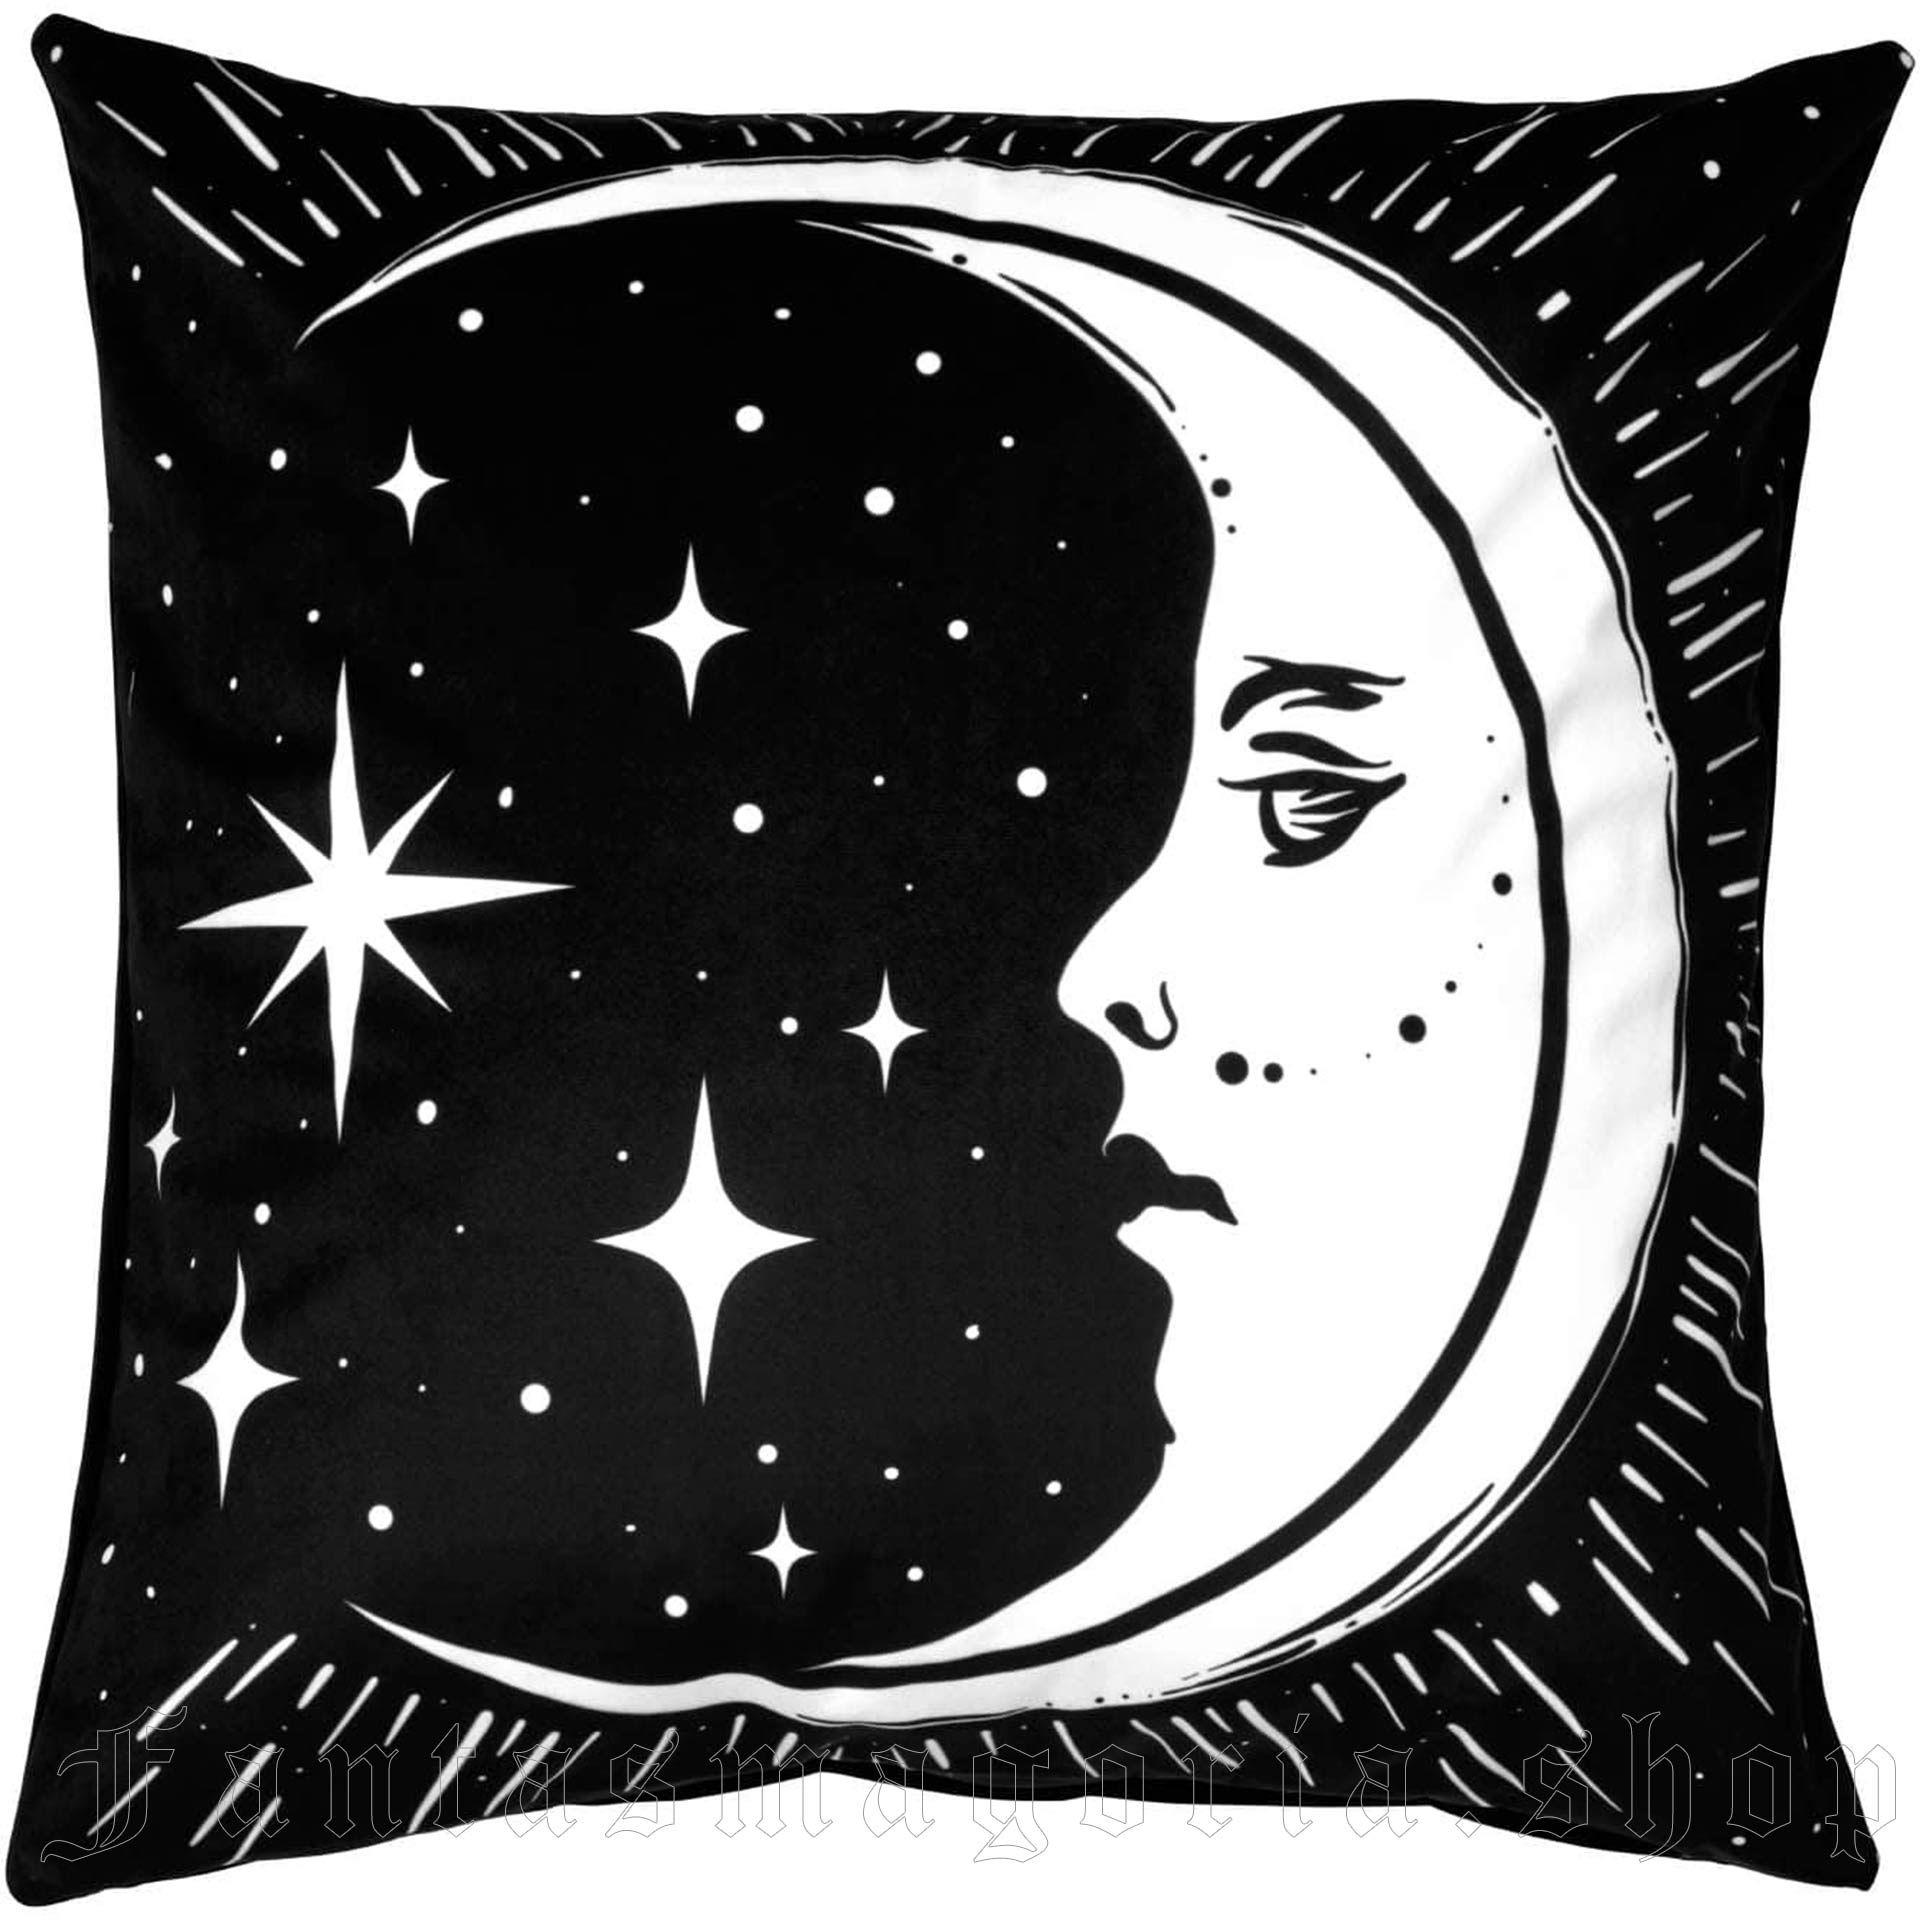 Vintage Moon Cushion Cover